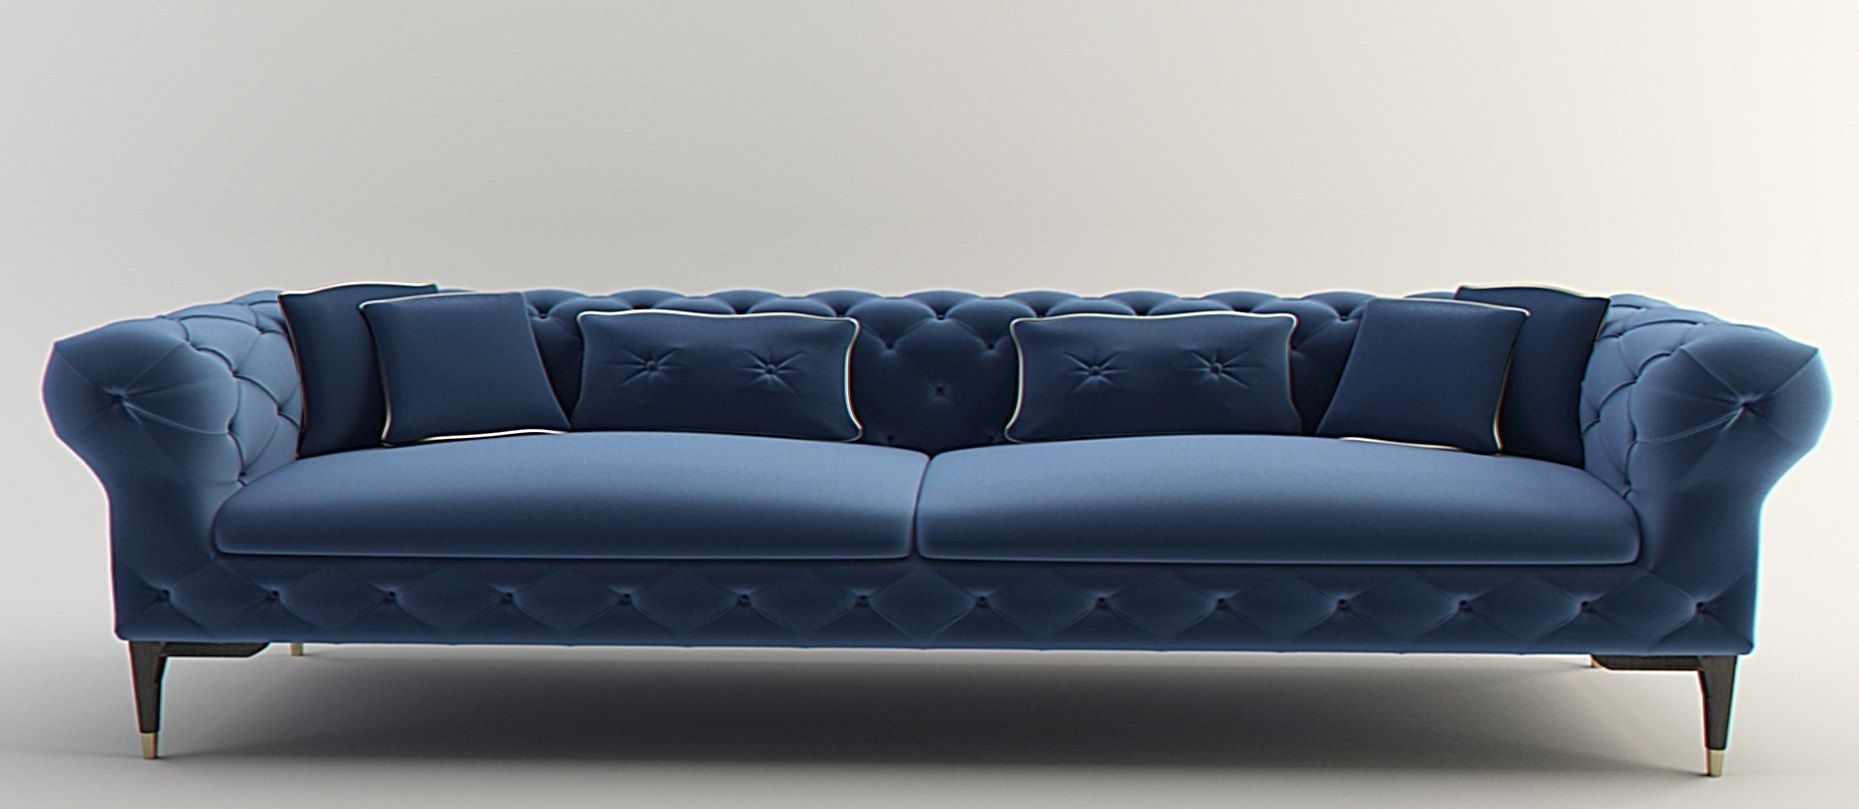 Sofa Set Low Price